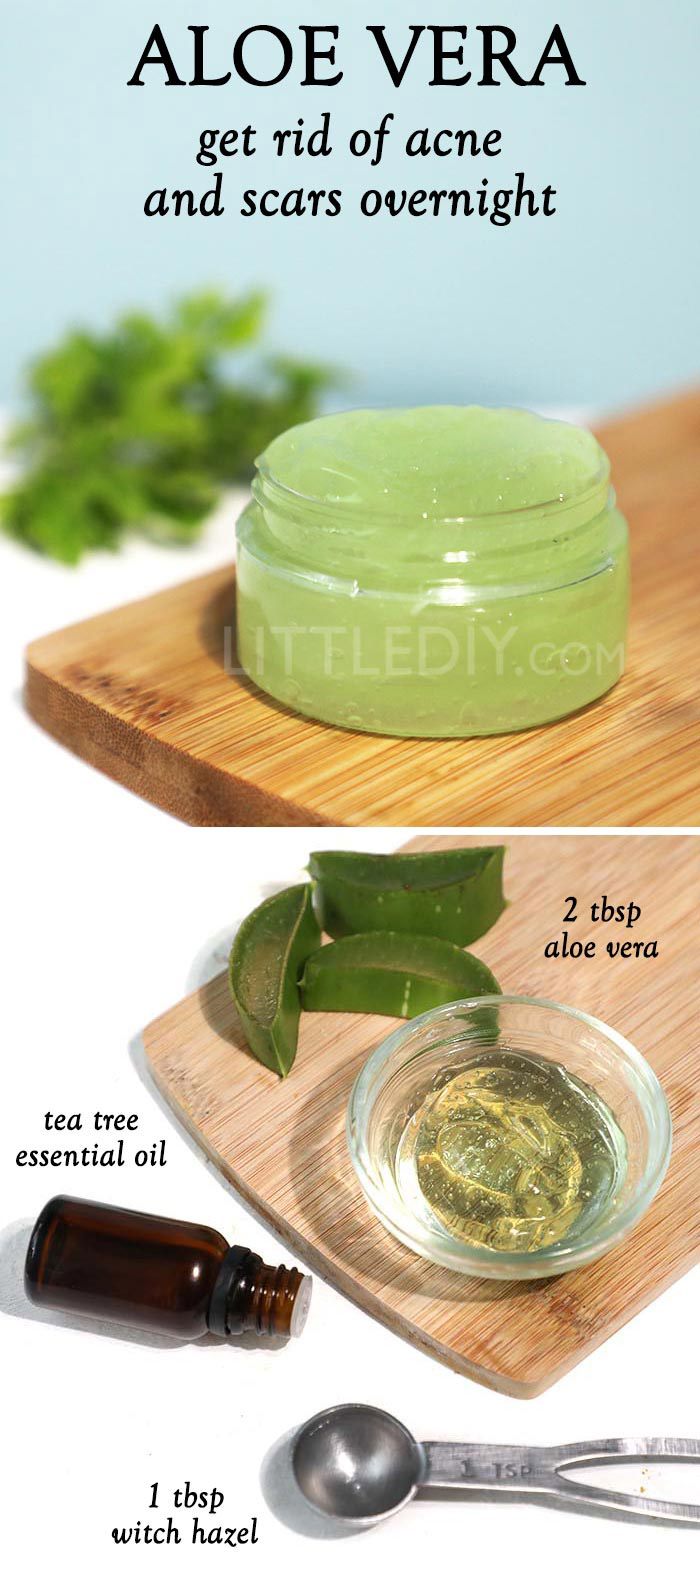 Aloe vera to clear acne and scar overnight